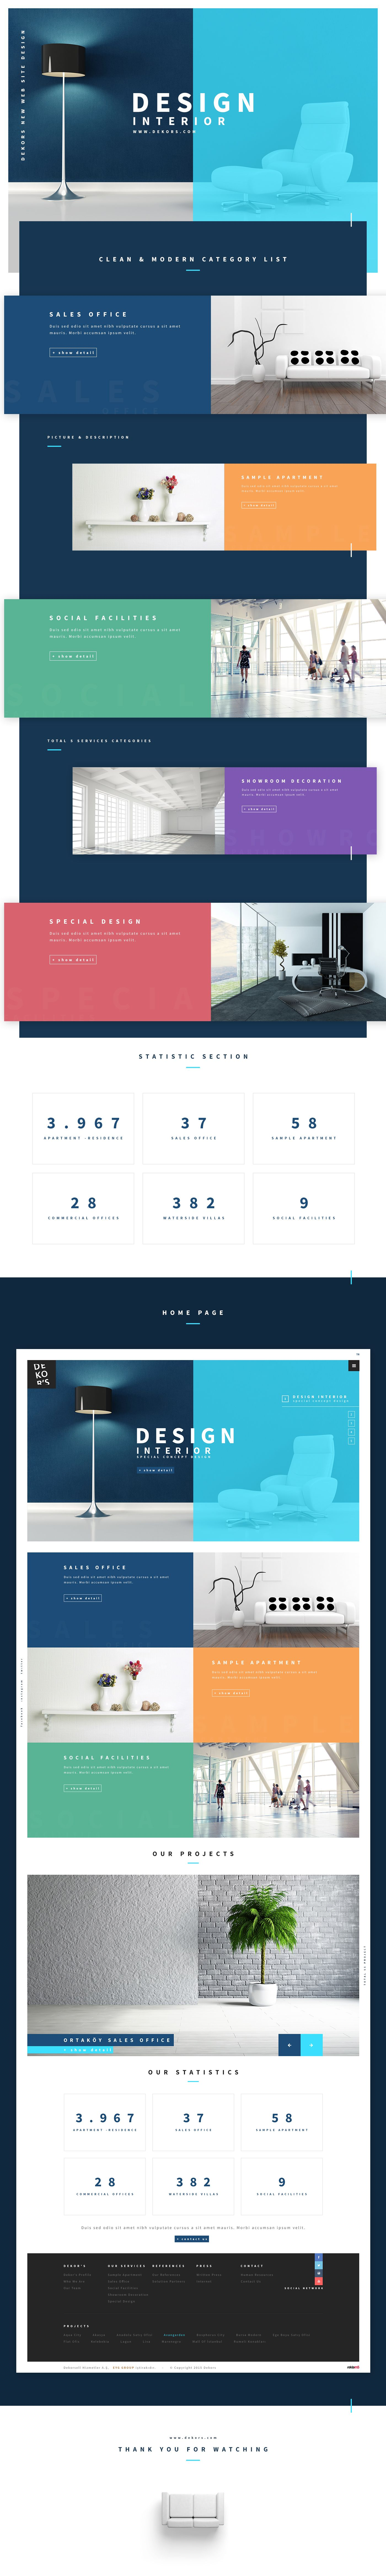 Dekor's New Web Site Design on Behance